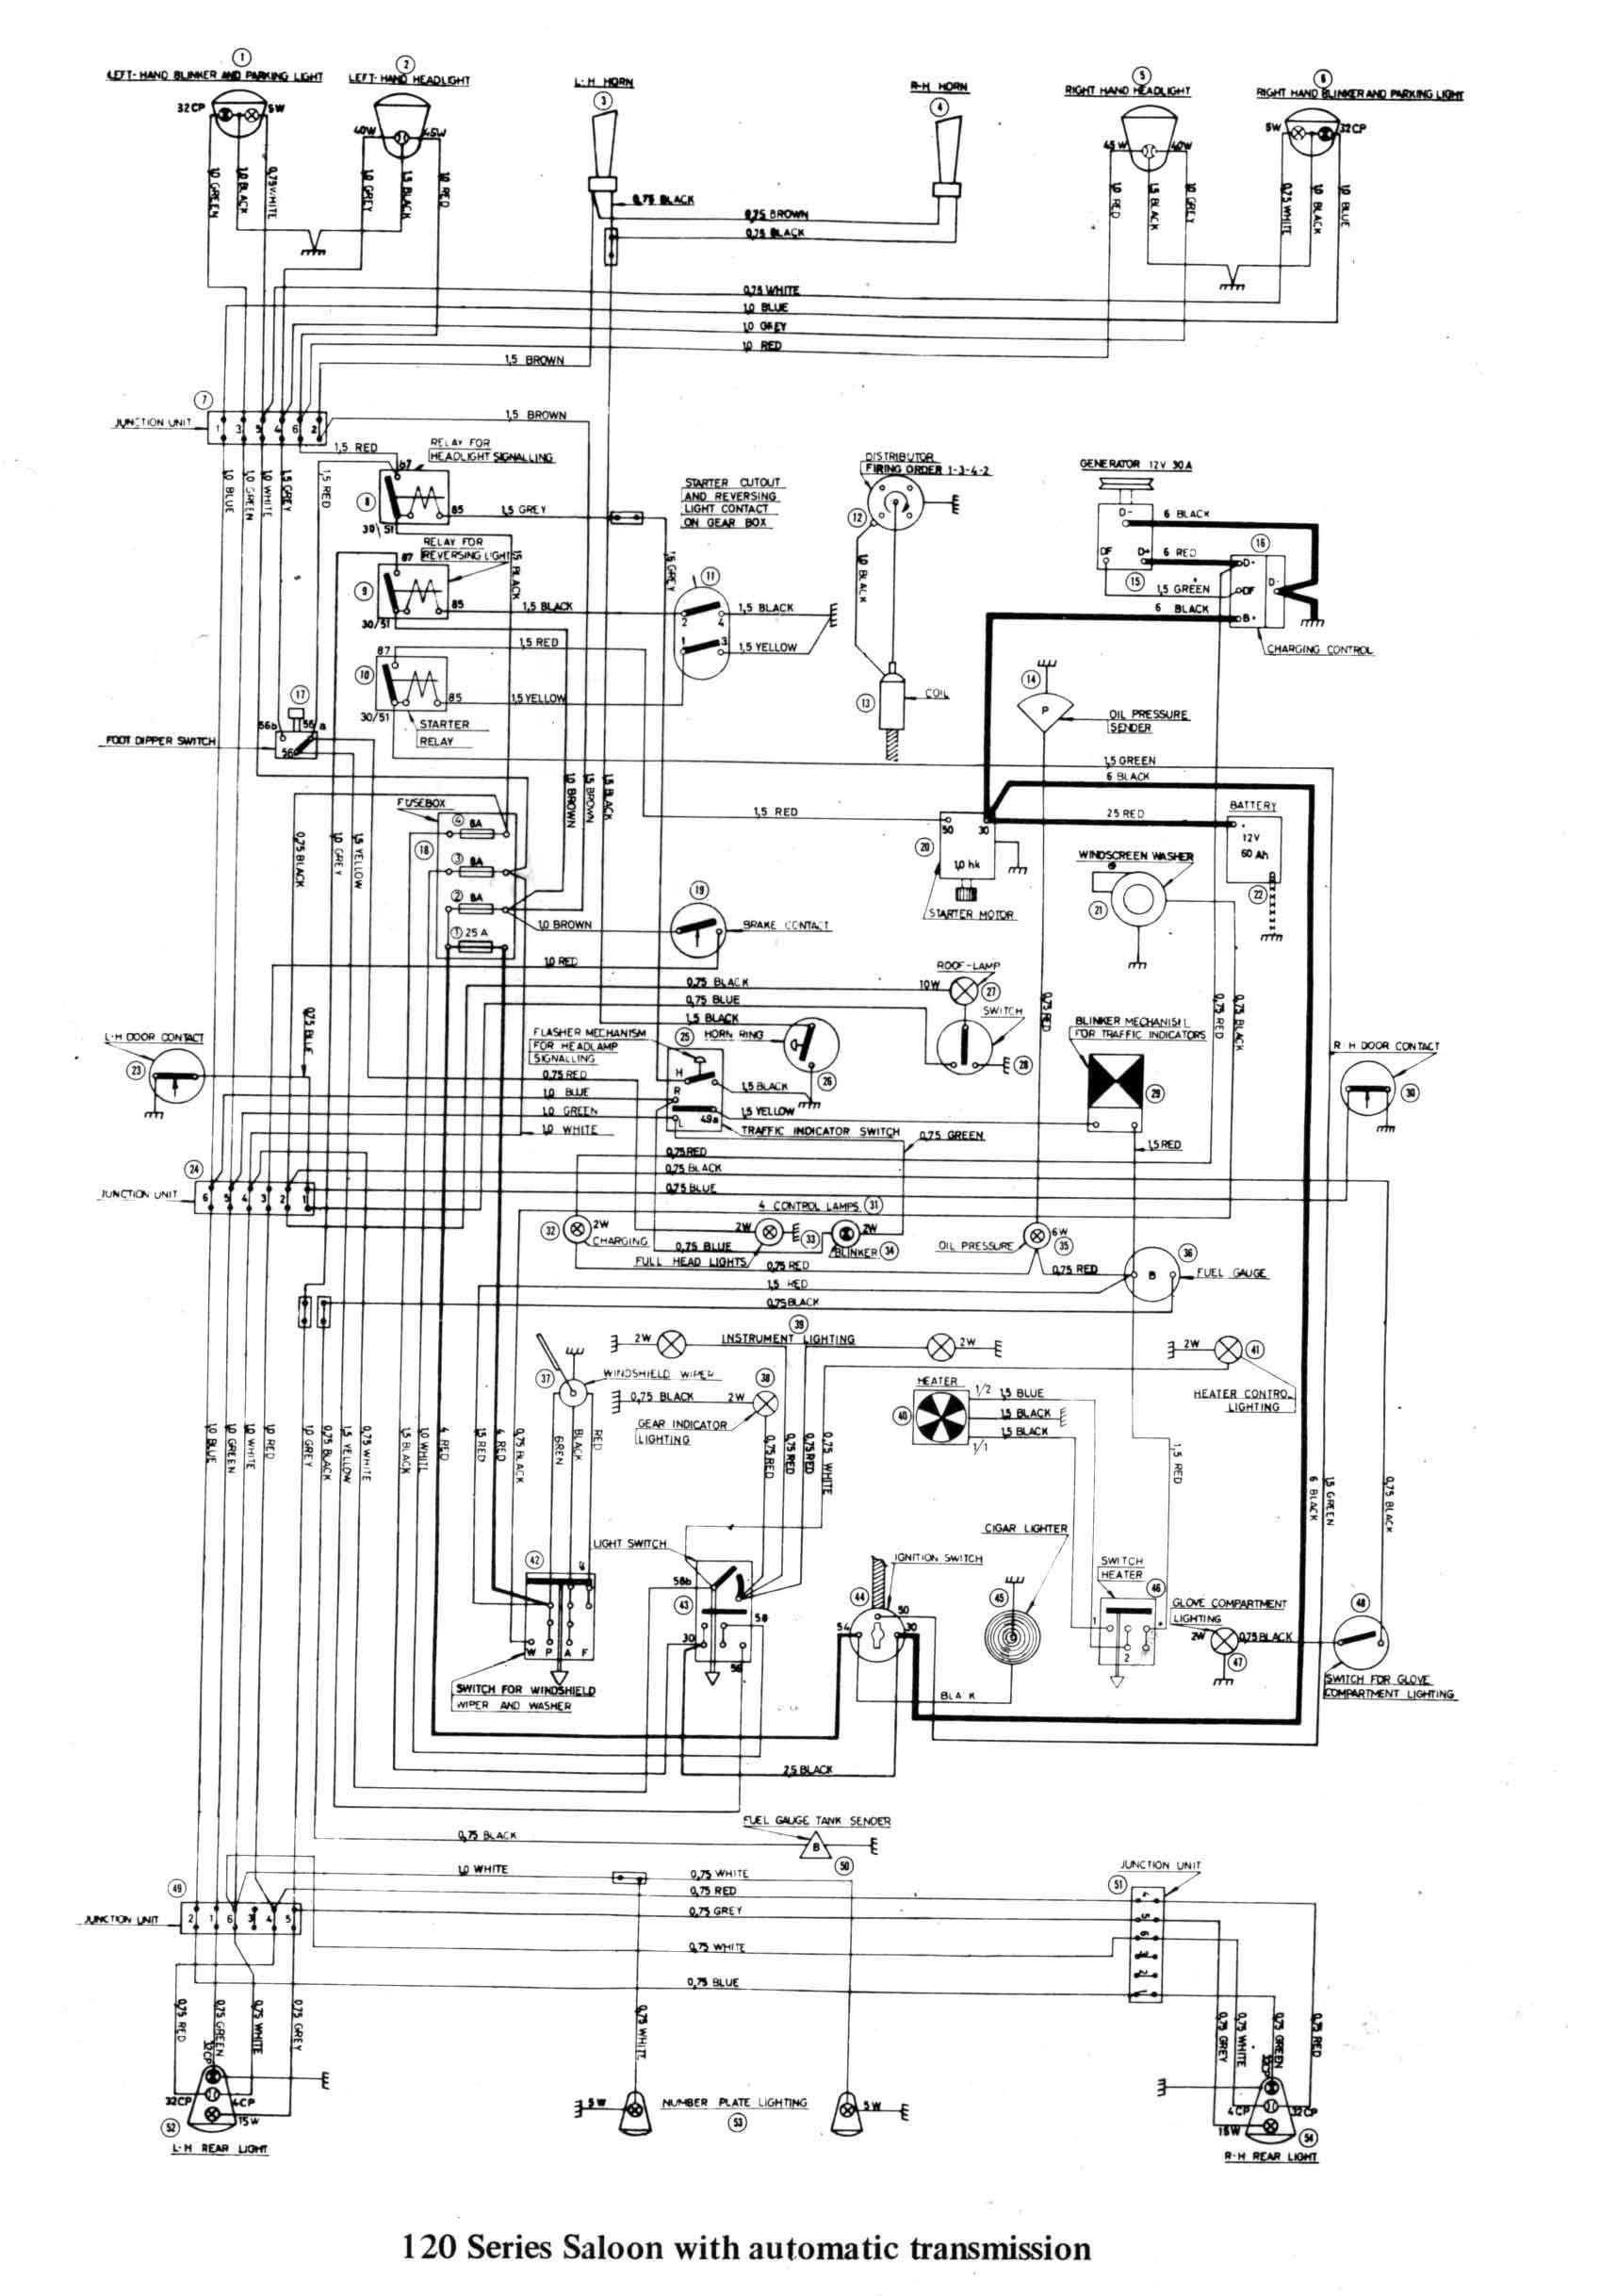 Ohv Engine Diagram 2004 Cadillac Escalade Trailer Wiring ... on